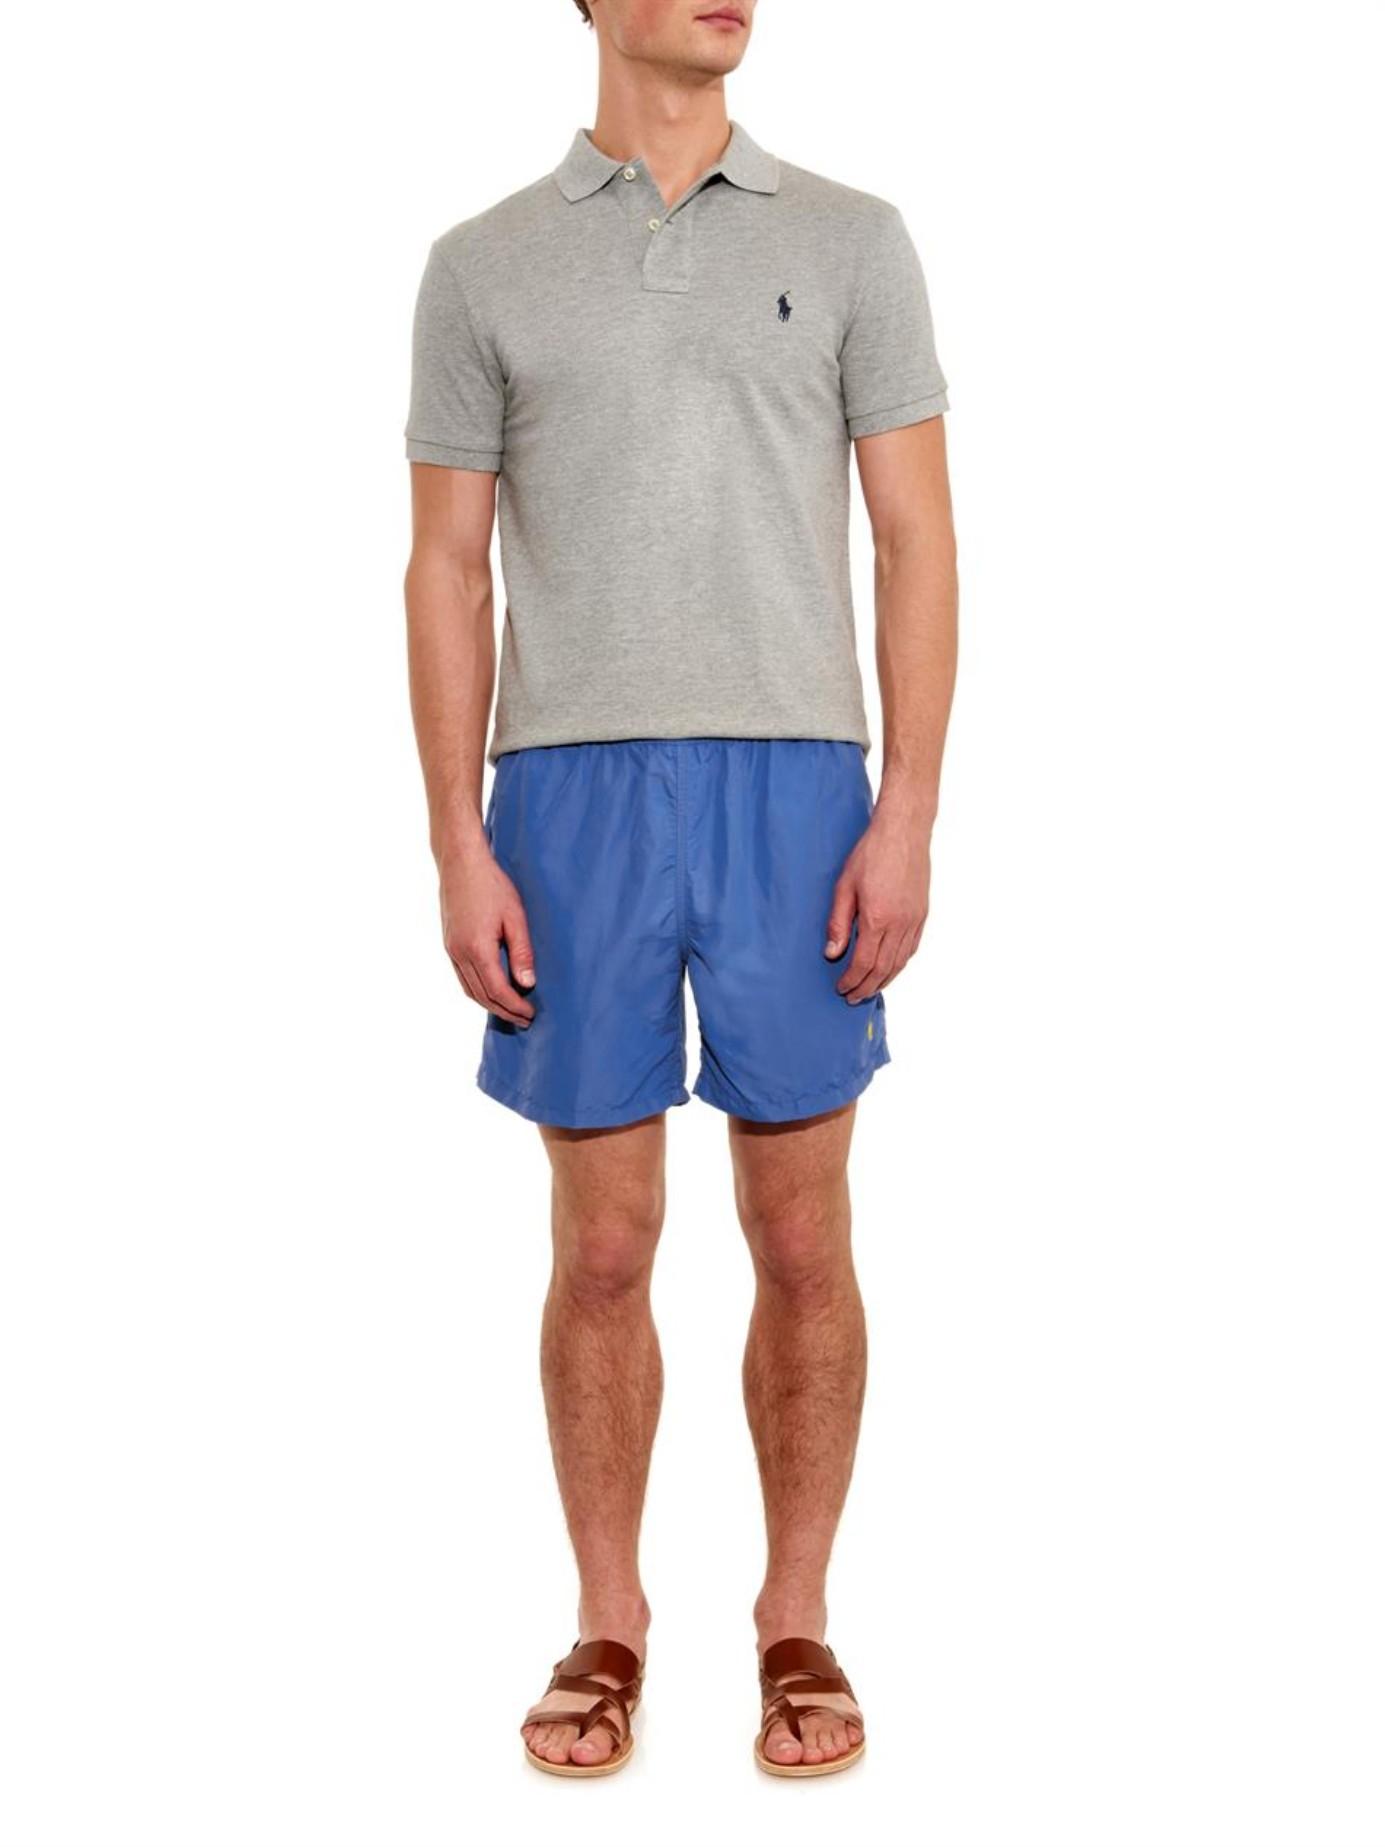 polo ralph lauren hawaiian fit 5 swim shorts in blue for men lyst. Black Bedroom Furniture Sets. Home Design Ideas